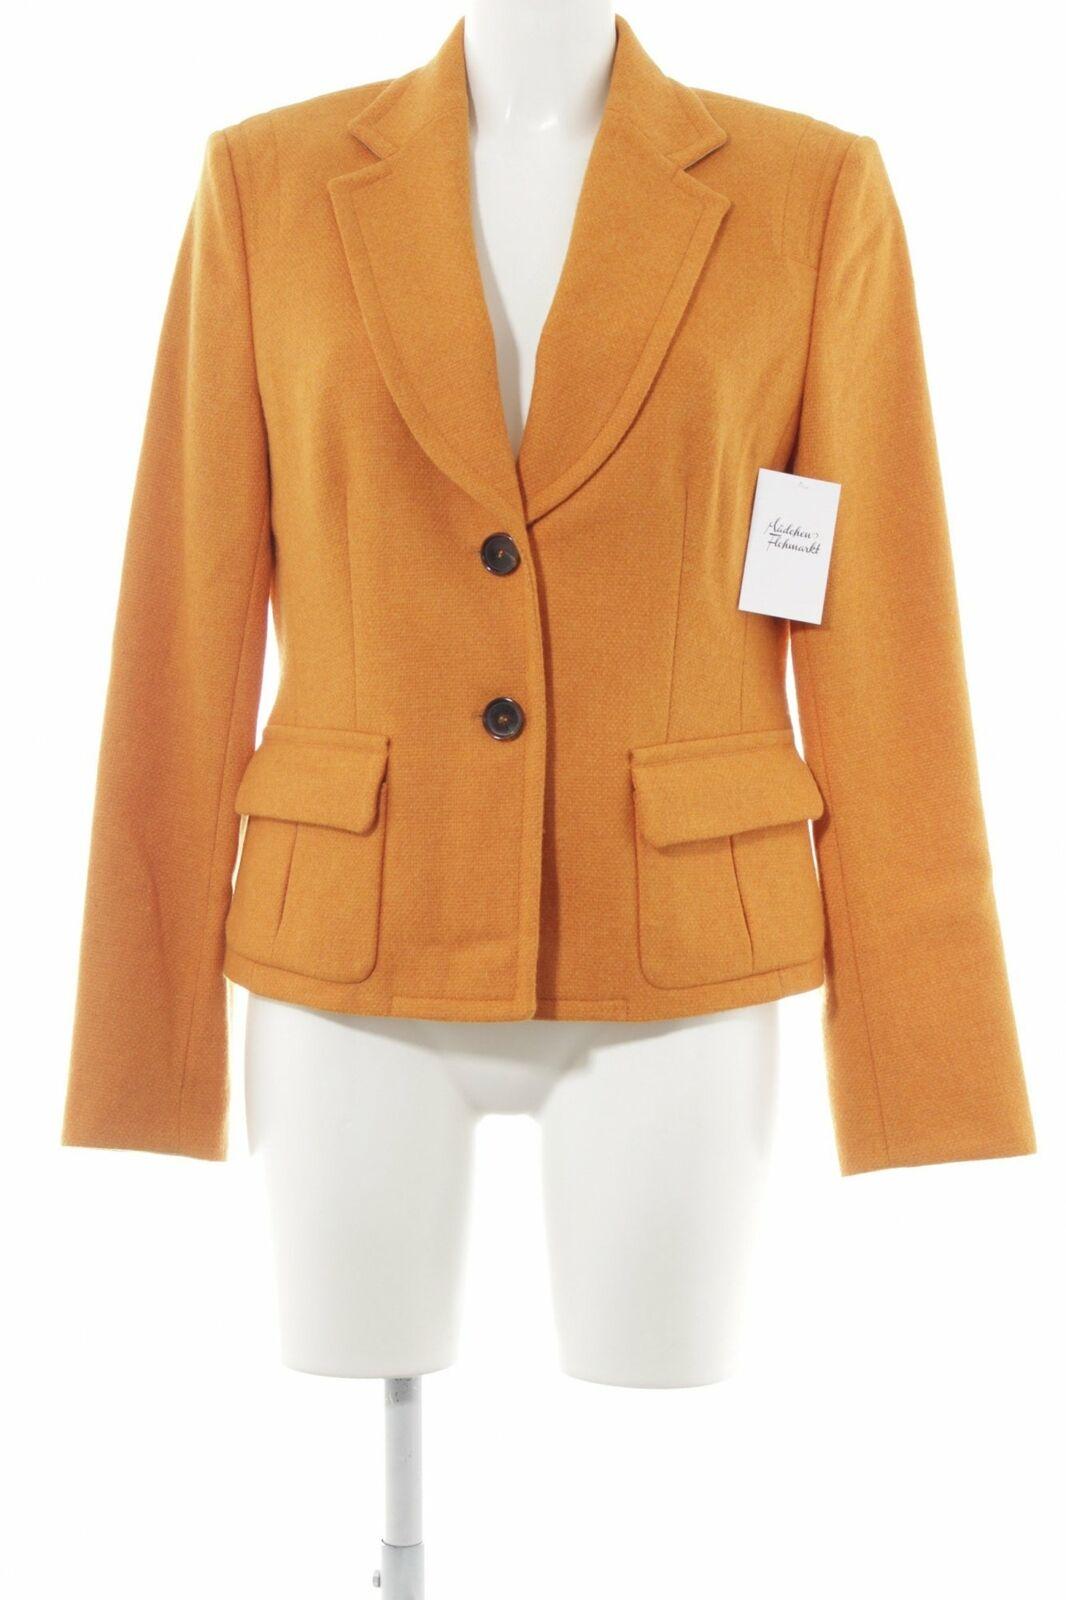 René LEZARD in lana-Blazer Arancione Scuro Stile Classica DONNA TG. de 40